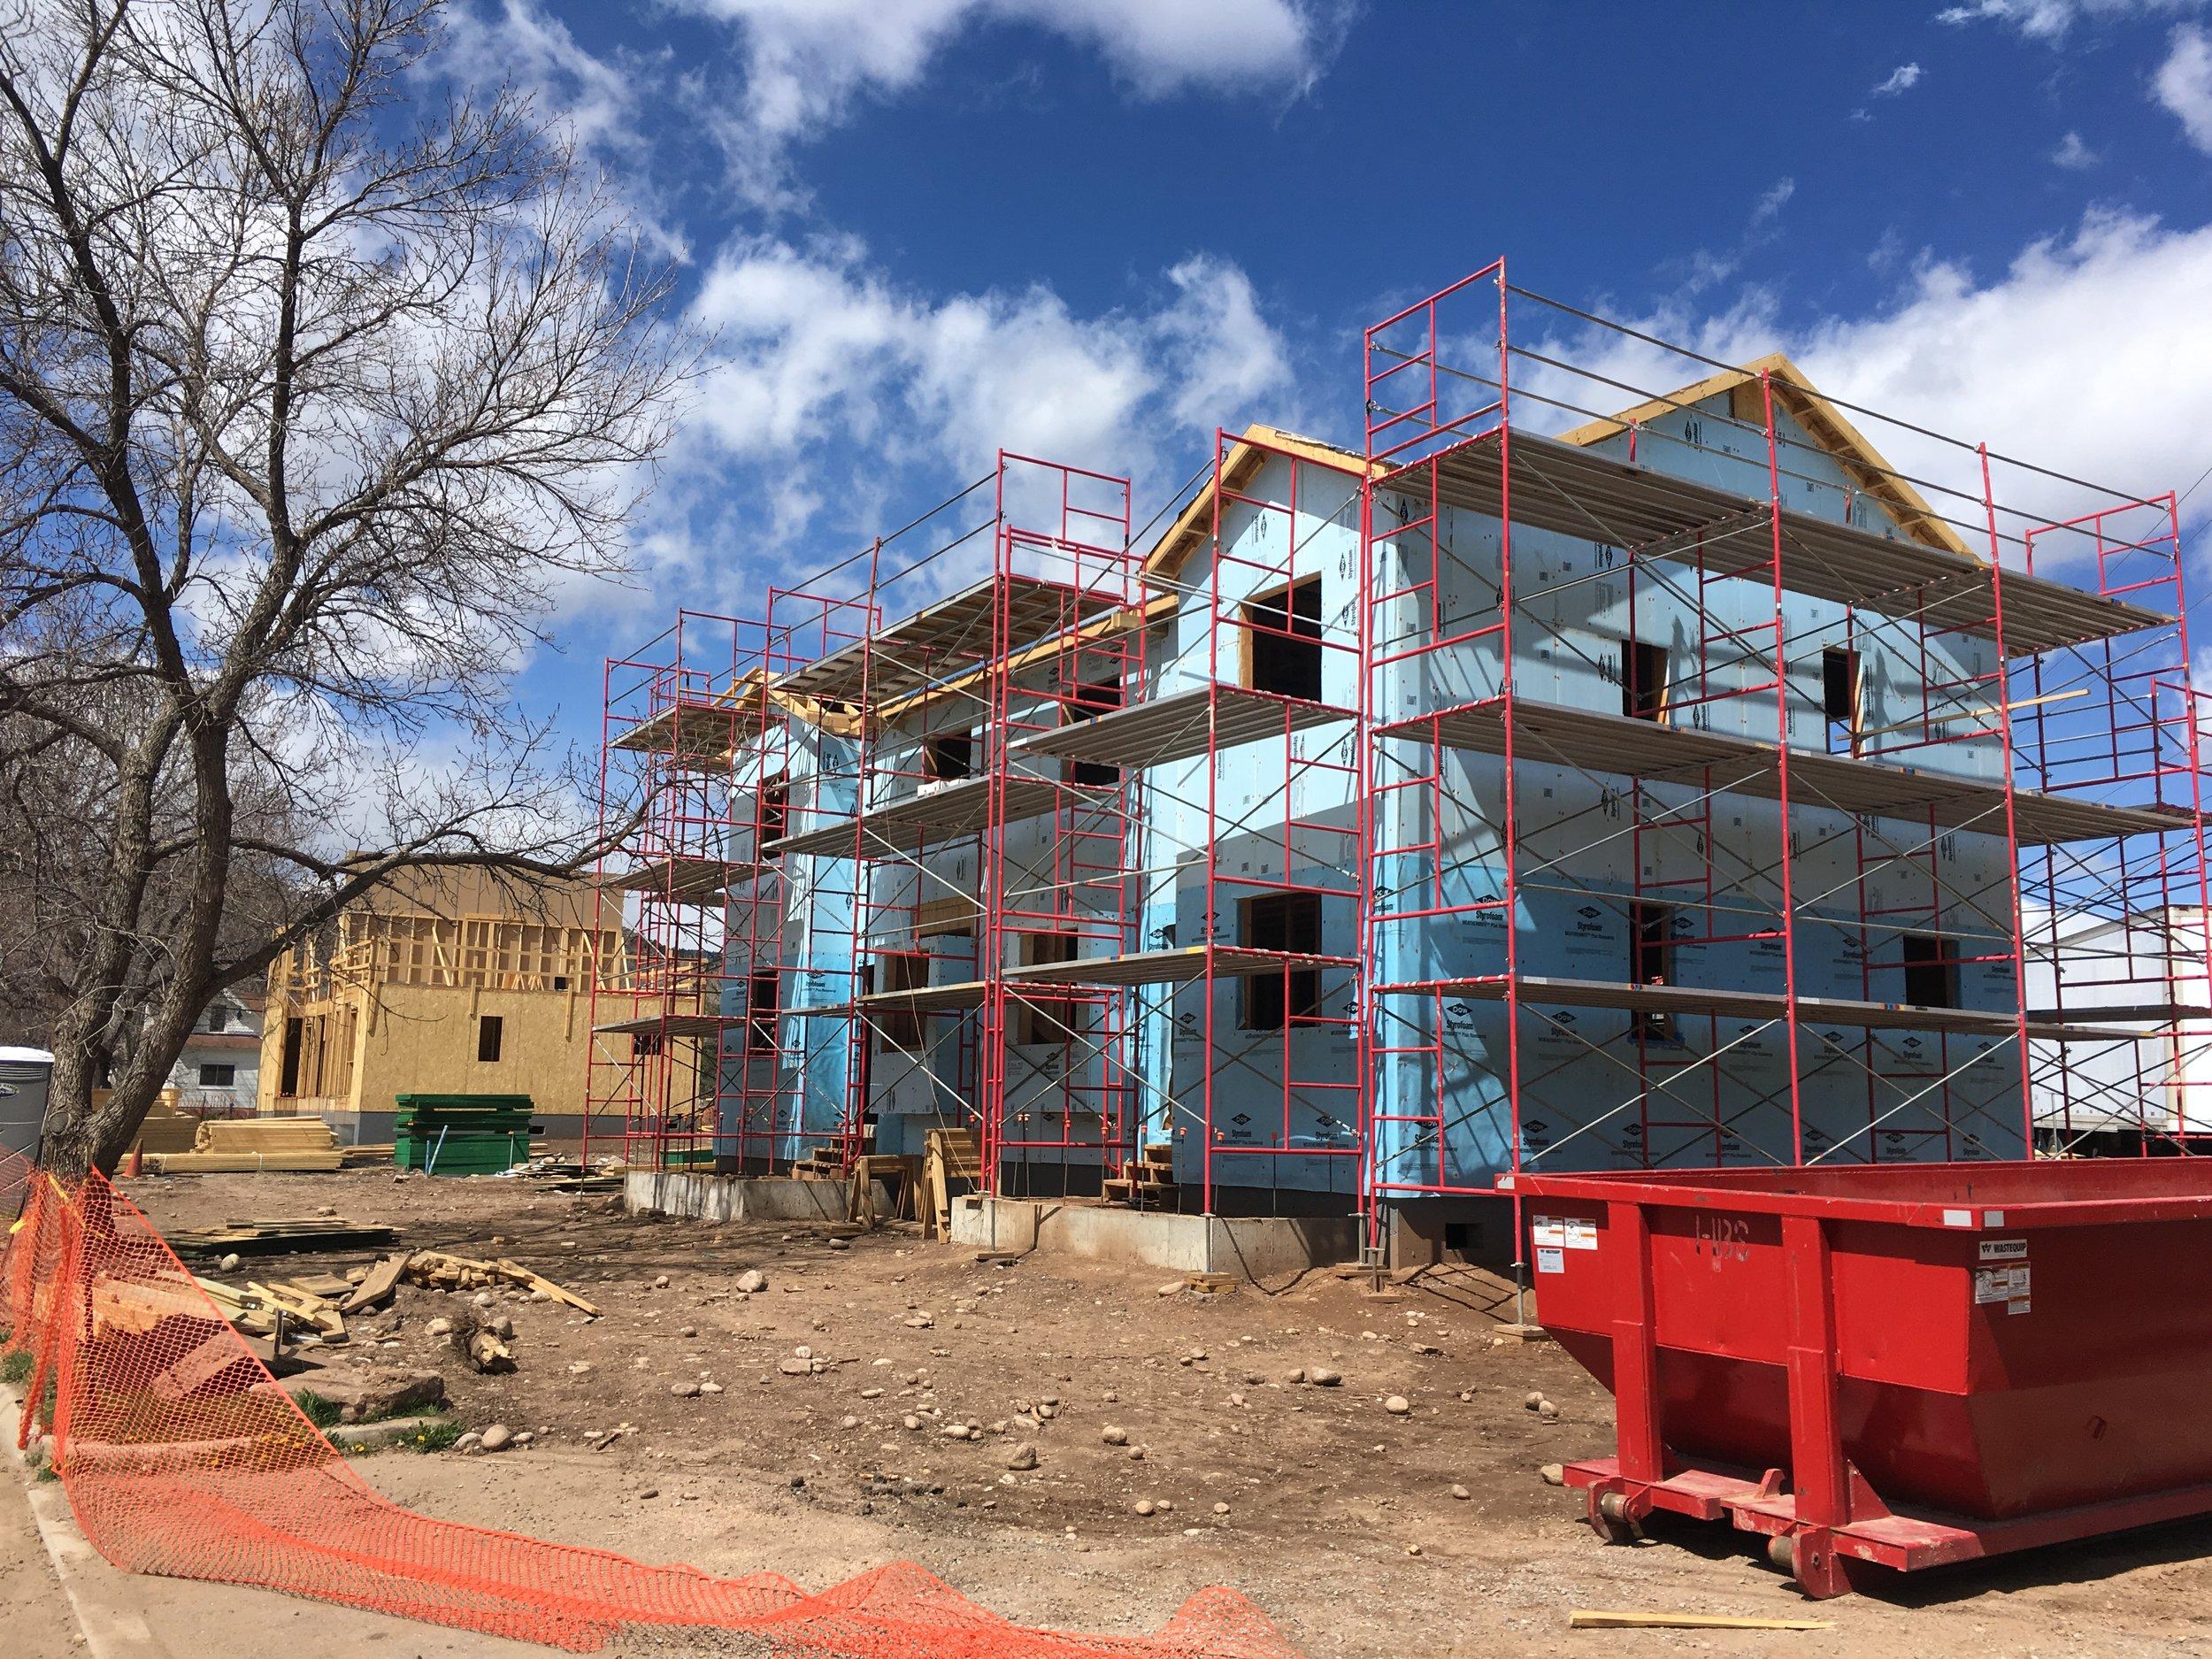 Houses April 2018.jpg